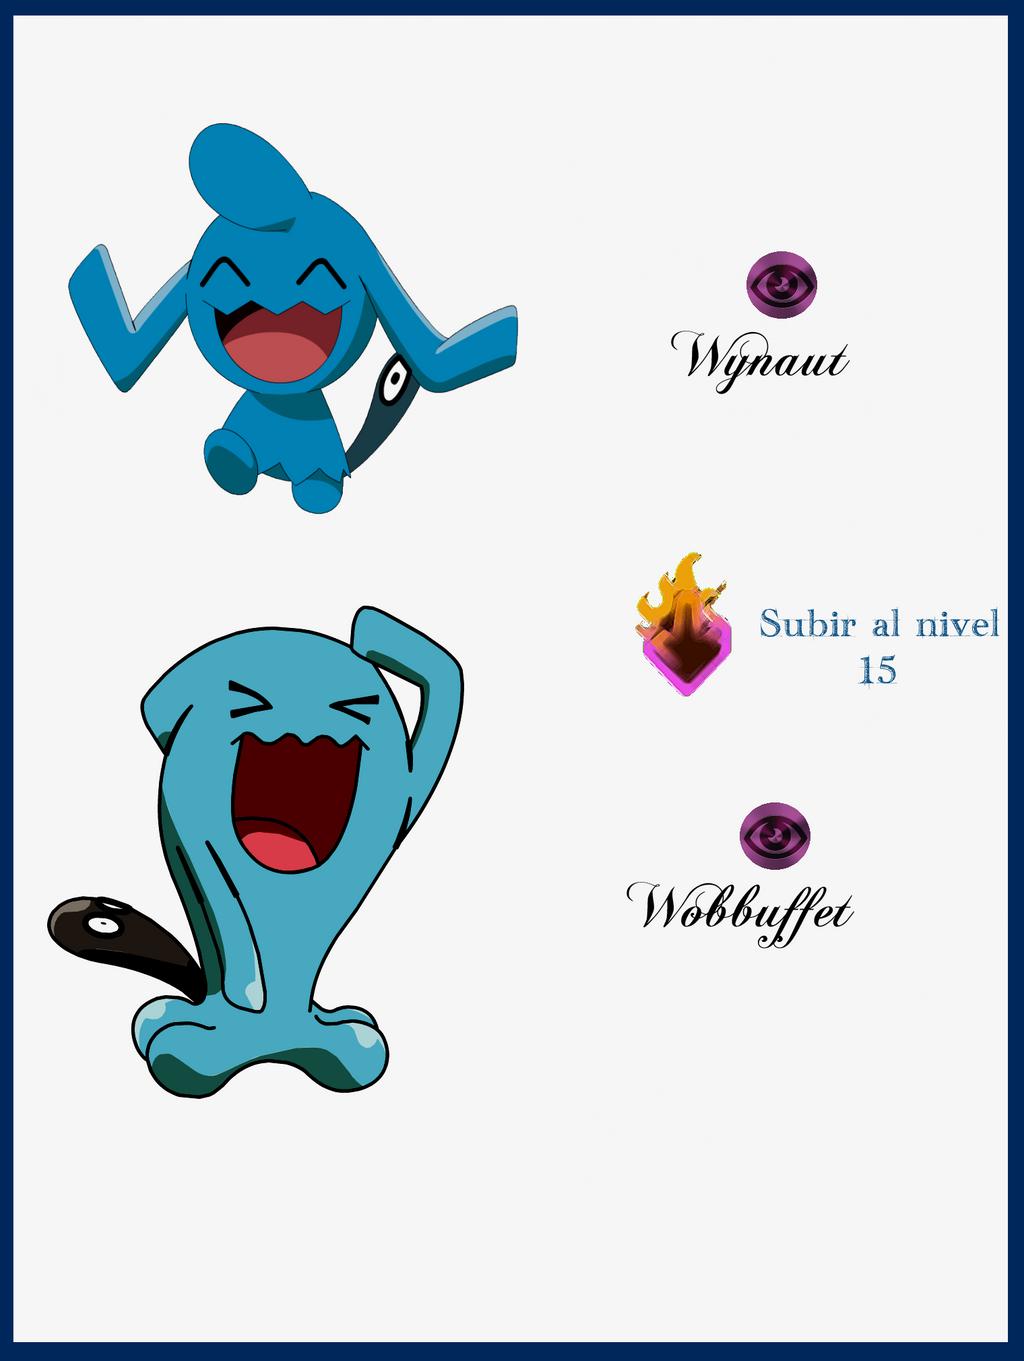 095 Whynaut Evoluciones by Maxconnery on DeviantArt Wailmer Evolution Chart